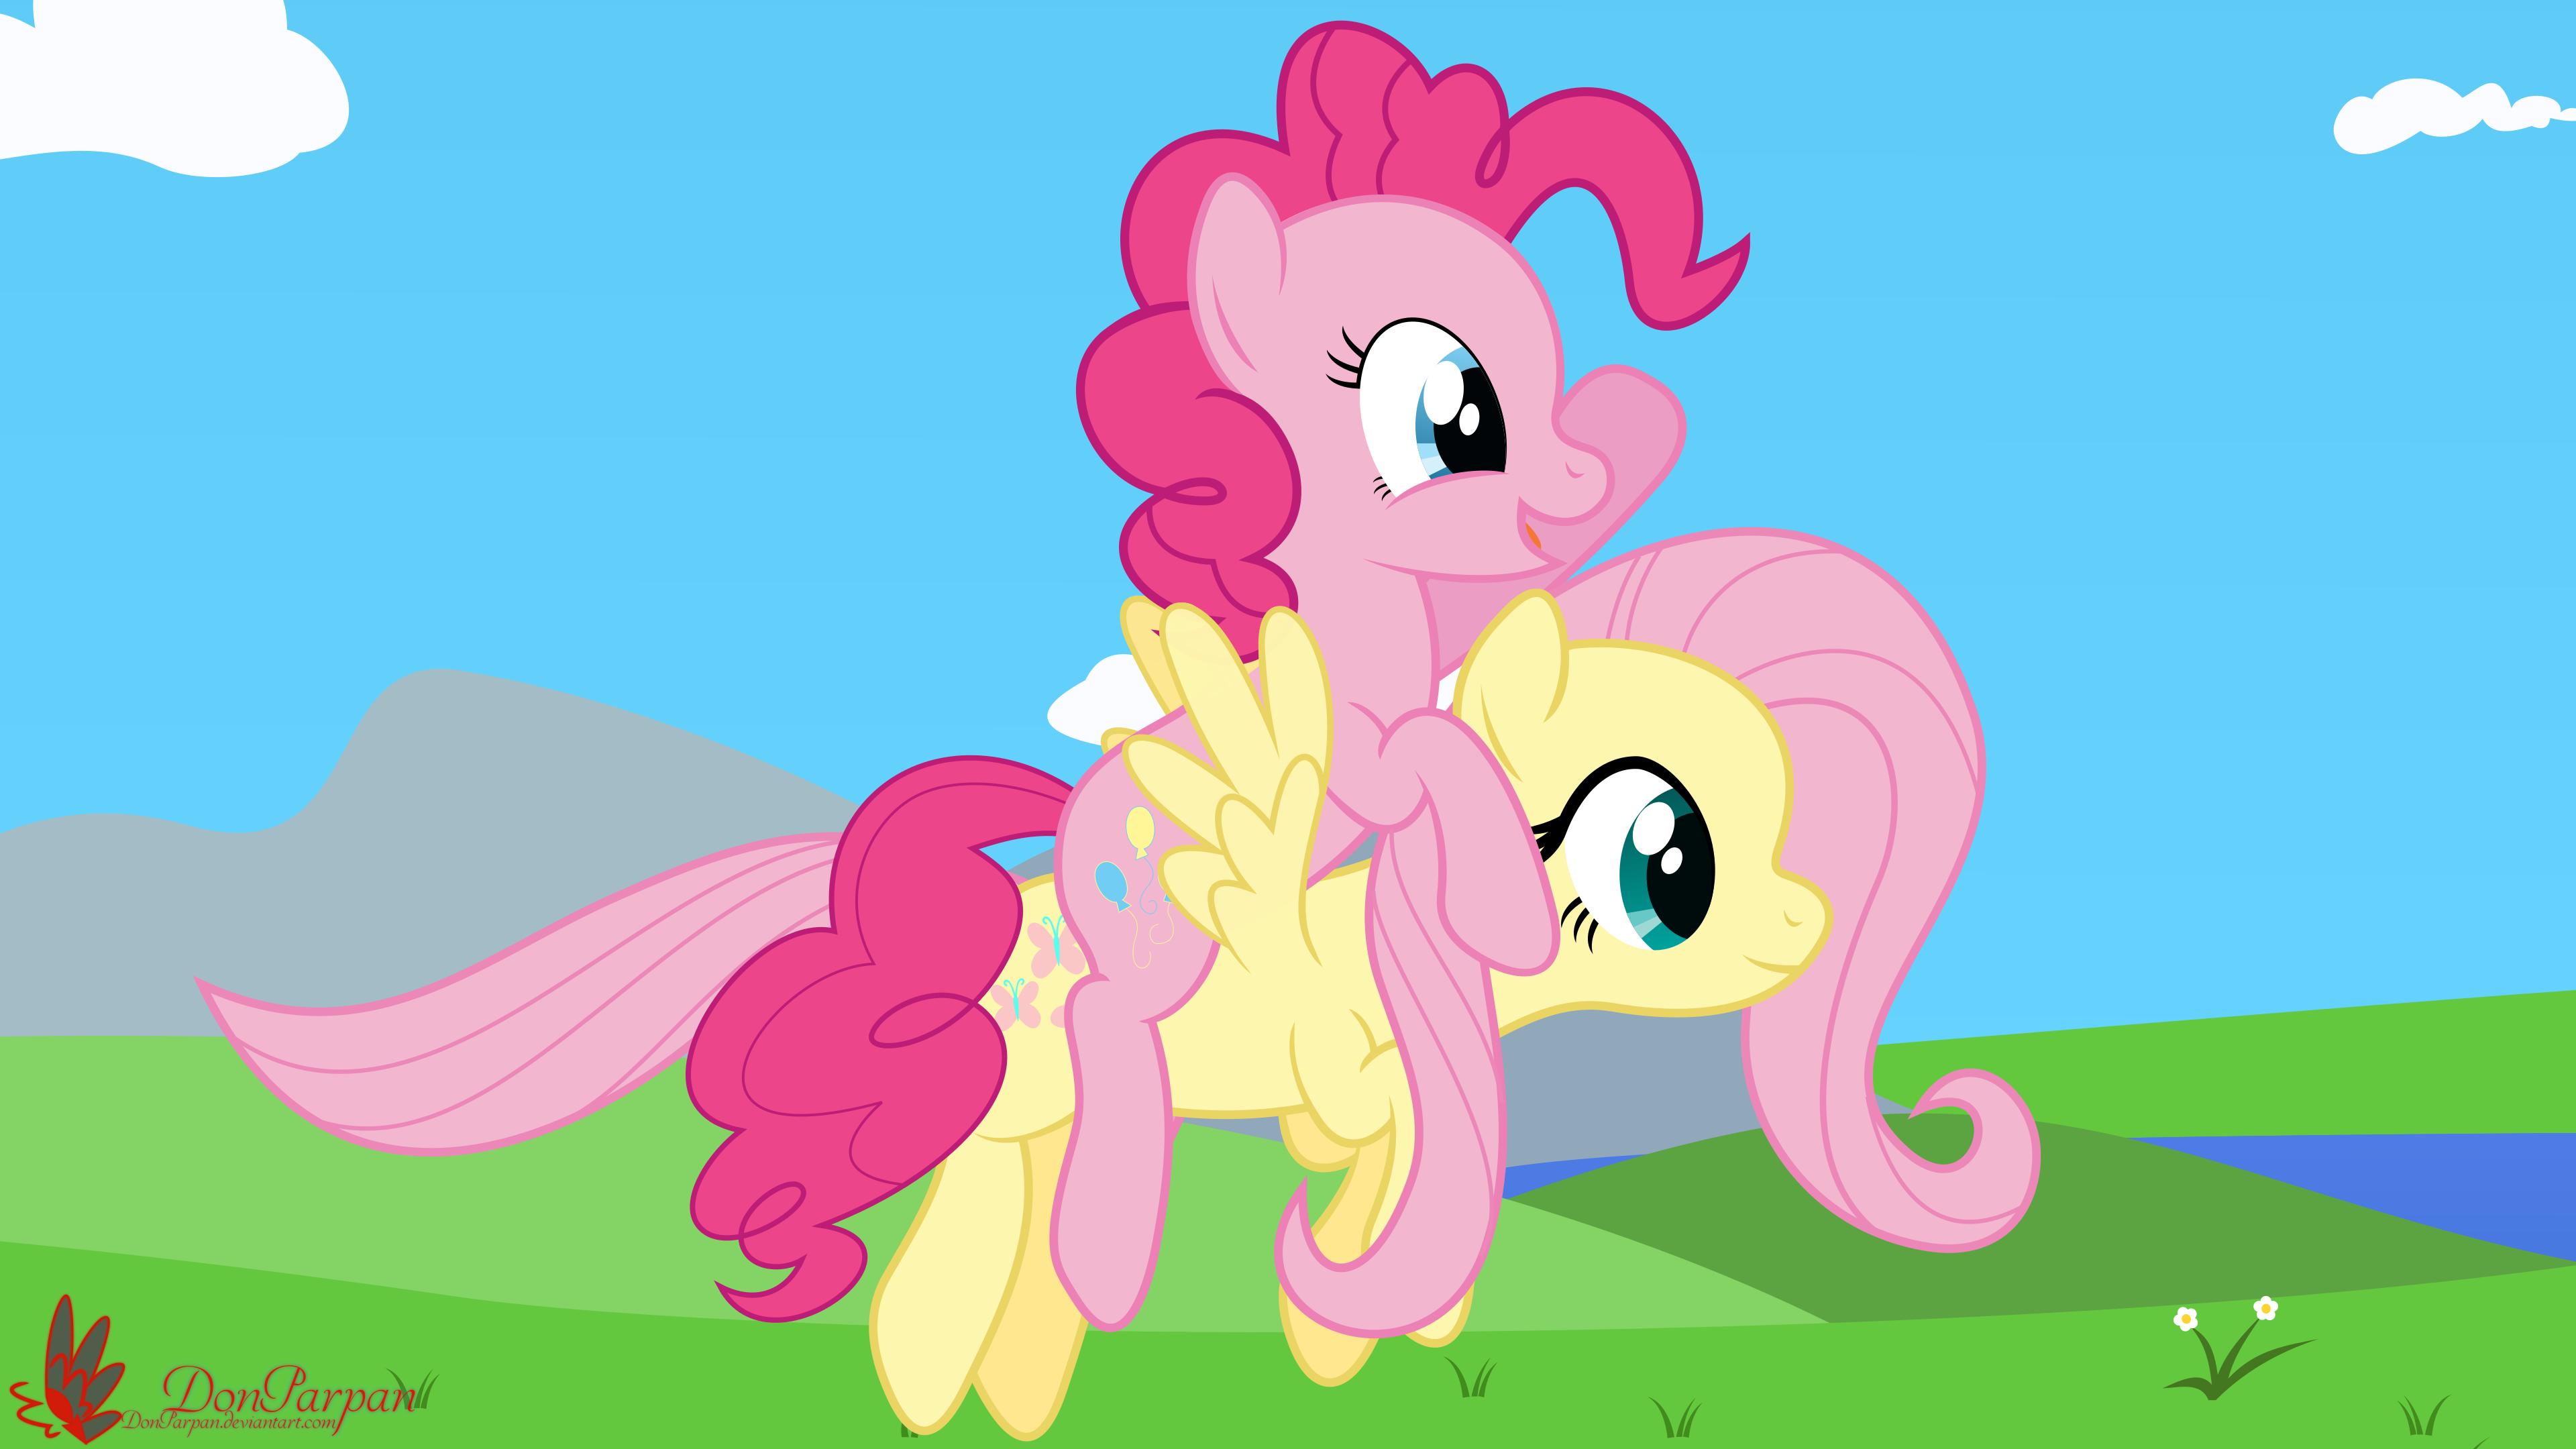 Image pinkie pie and fluttershy flying png my little pony fan -  1162029 Artist Waveywaves Flutterpie Fluttershy Flying Lesbian Pinkie Pie Safe Shipping Vector Derpibooru My Little Pony Friendship Is Magic